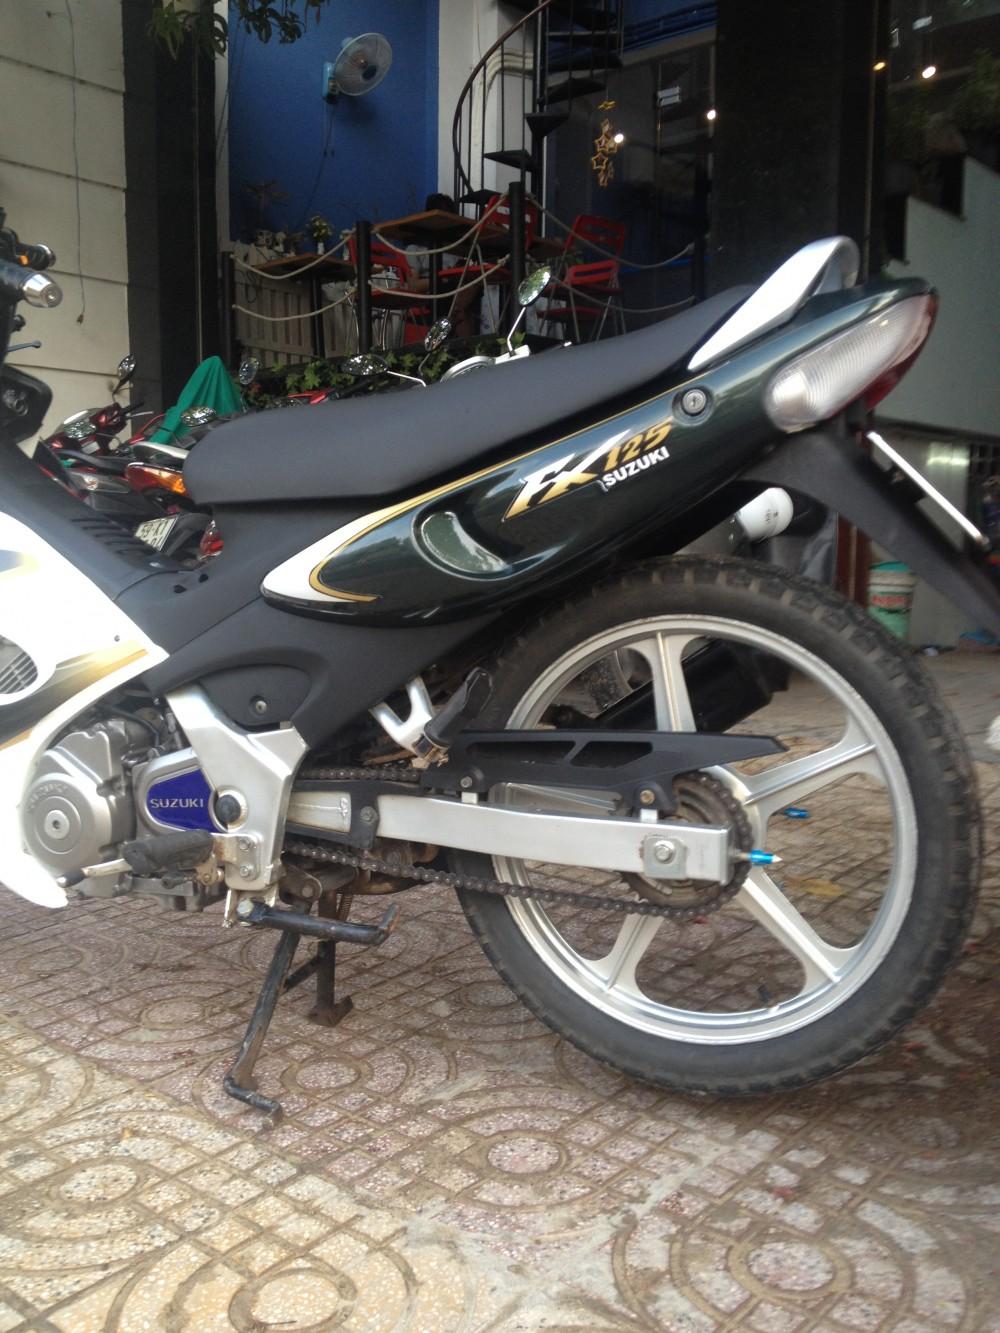 TPHCM FX 125 cc BSTP mau xanh - 6